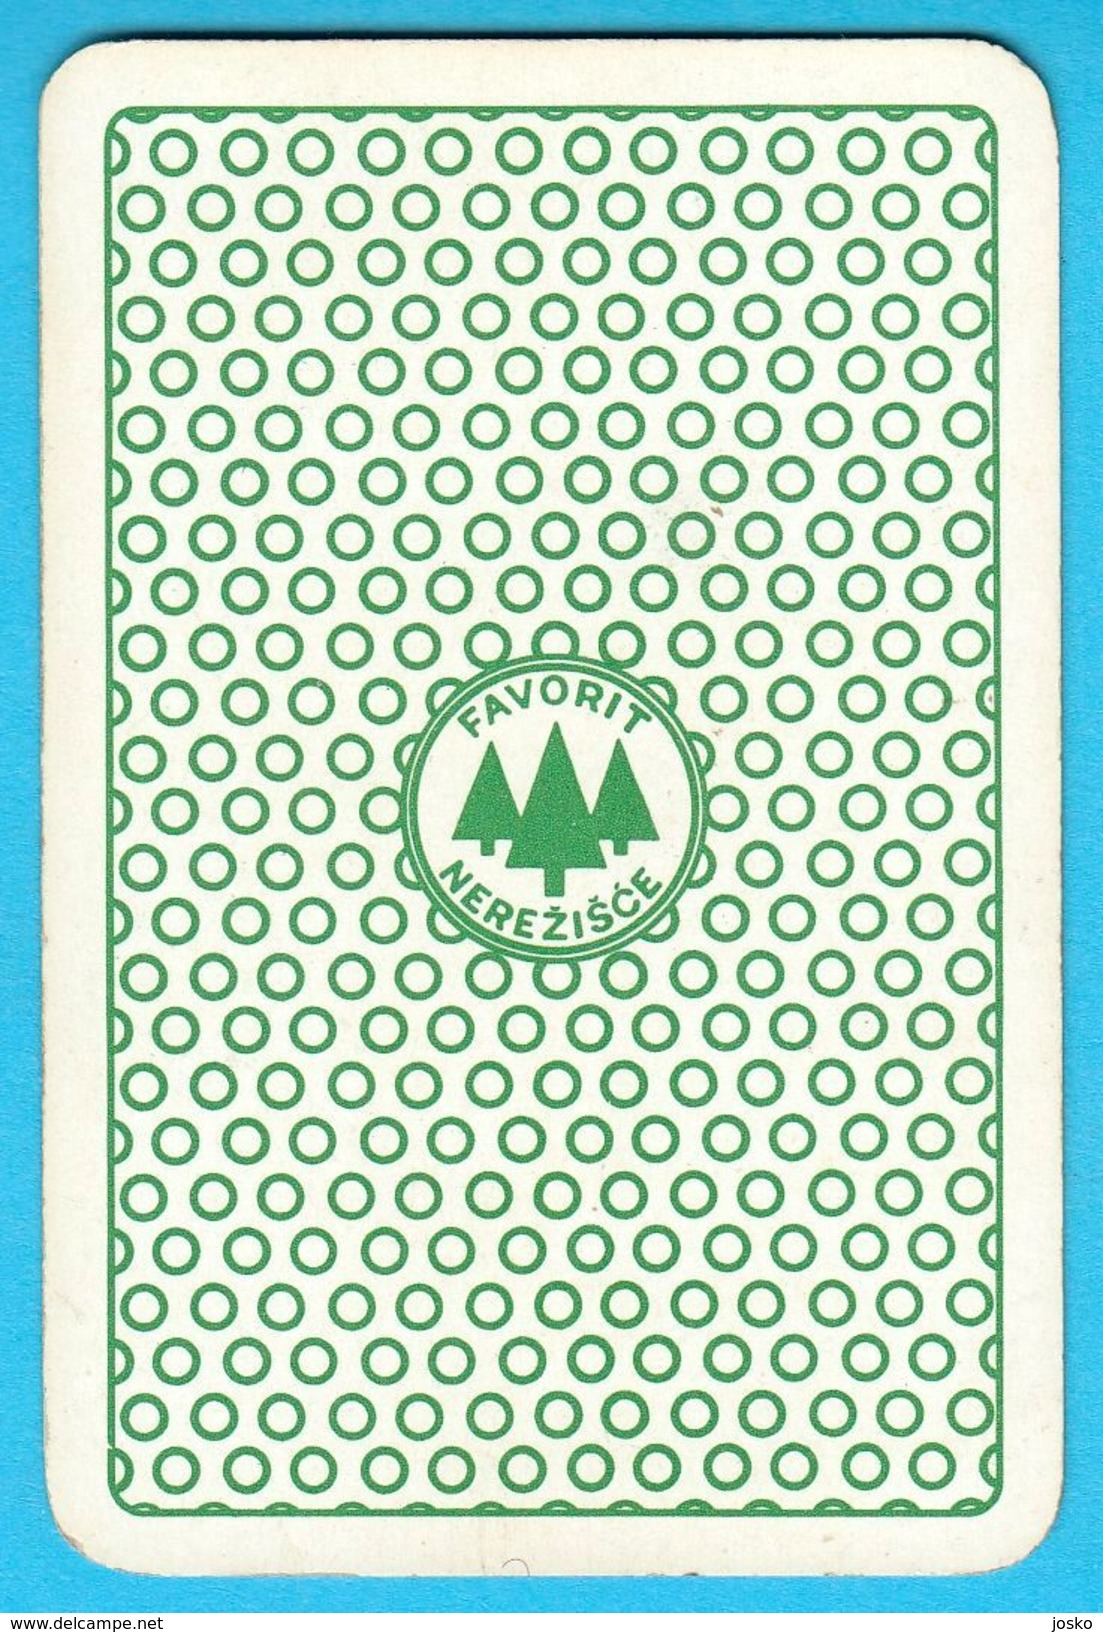 HANNA-BARBERA  - Yugoslav Vintage Playing Card No. 4a ( Boxing ) Issued 1970's By Favorit ** Carte à Jouer Spielkarte - Cartes à Jouer